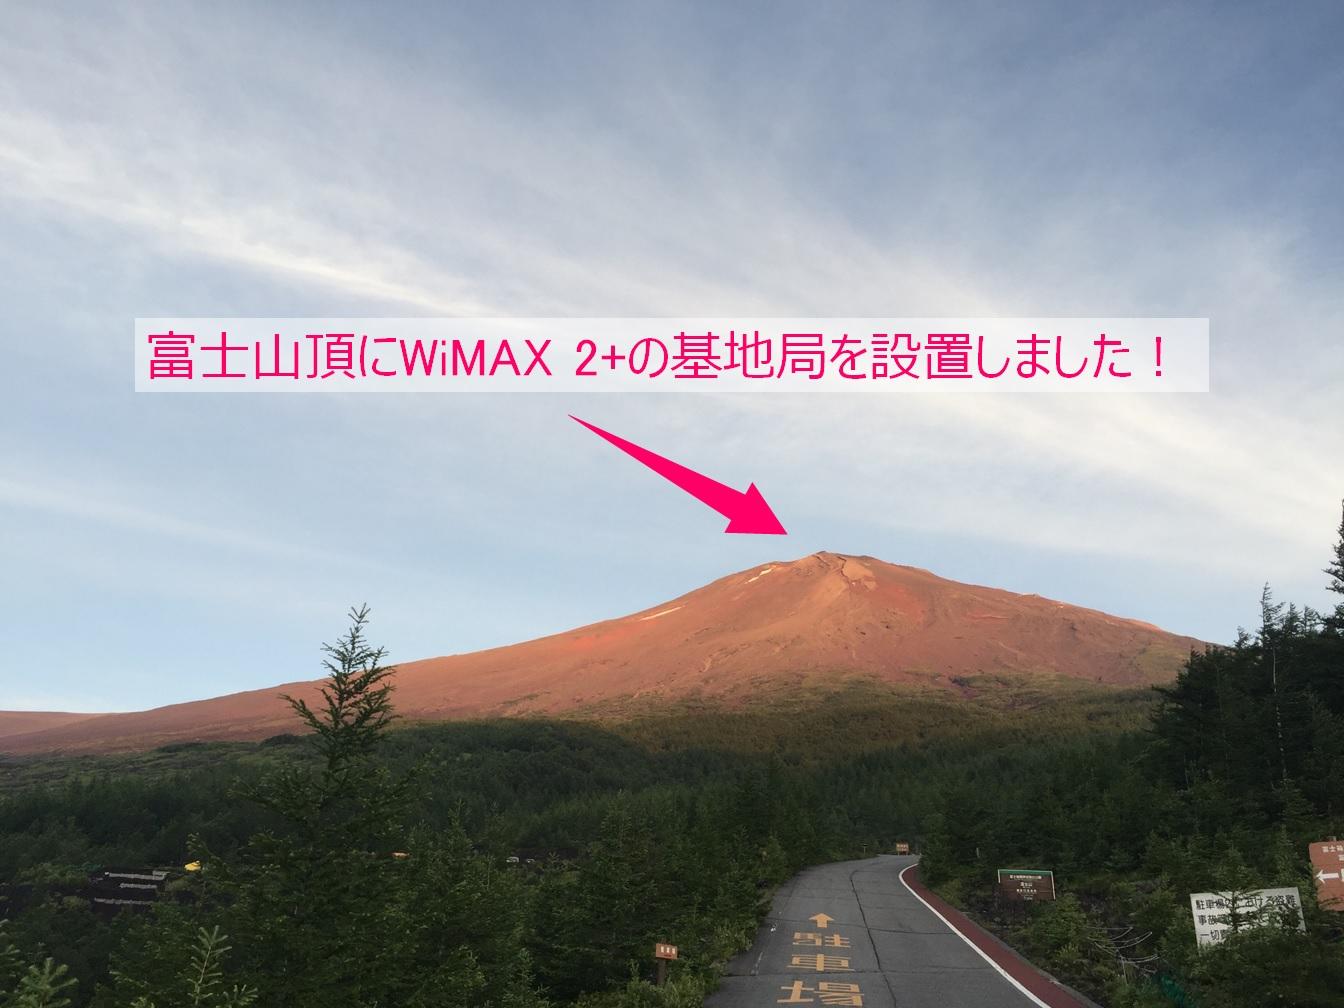 http://www.uqwimax.jp/area/area_blog/2016/08/10/images/20160811%E5%AF%8C%E5%A3%AB%E5%B1%B101.JPG